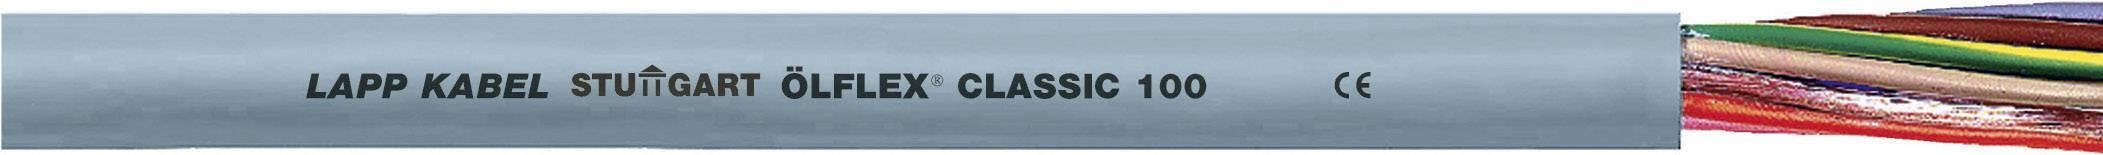 Kabel LappKabel Ölflex CLASSIC 100 5G16 (00101133), PVC, 22,8 mm, 750 V, šedá, 1000 m